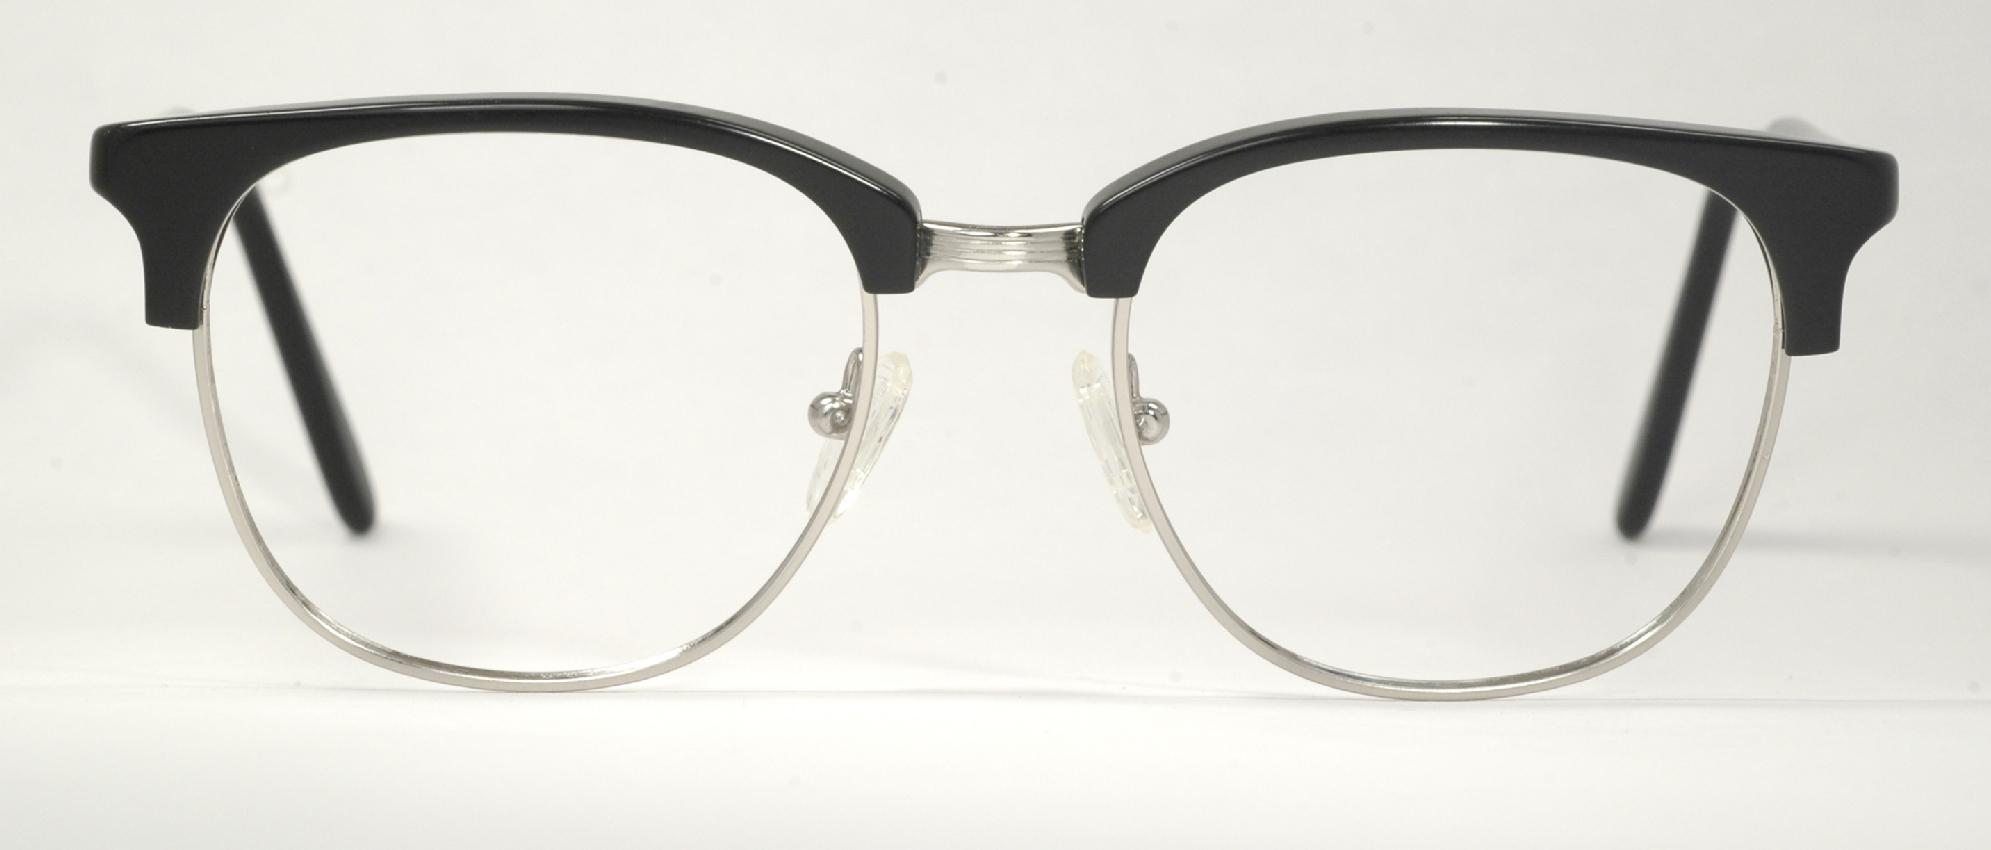 optometrist attic g malcolm x vintage black silver